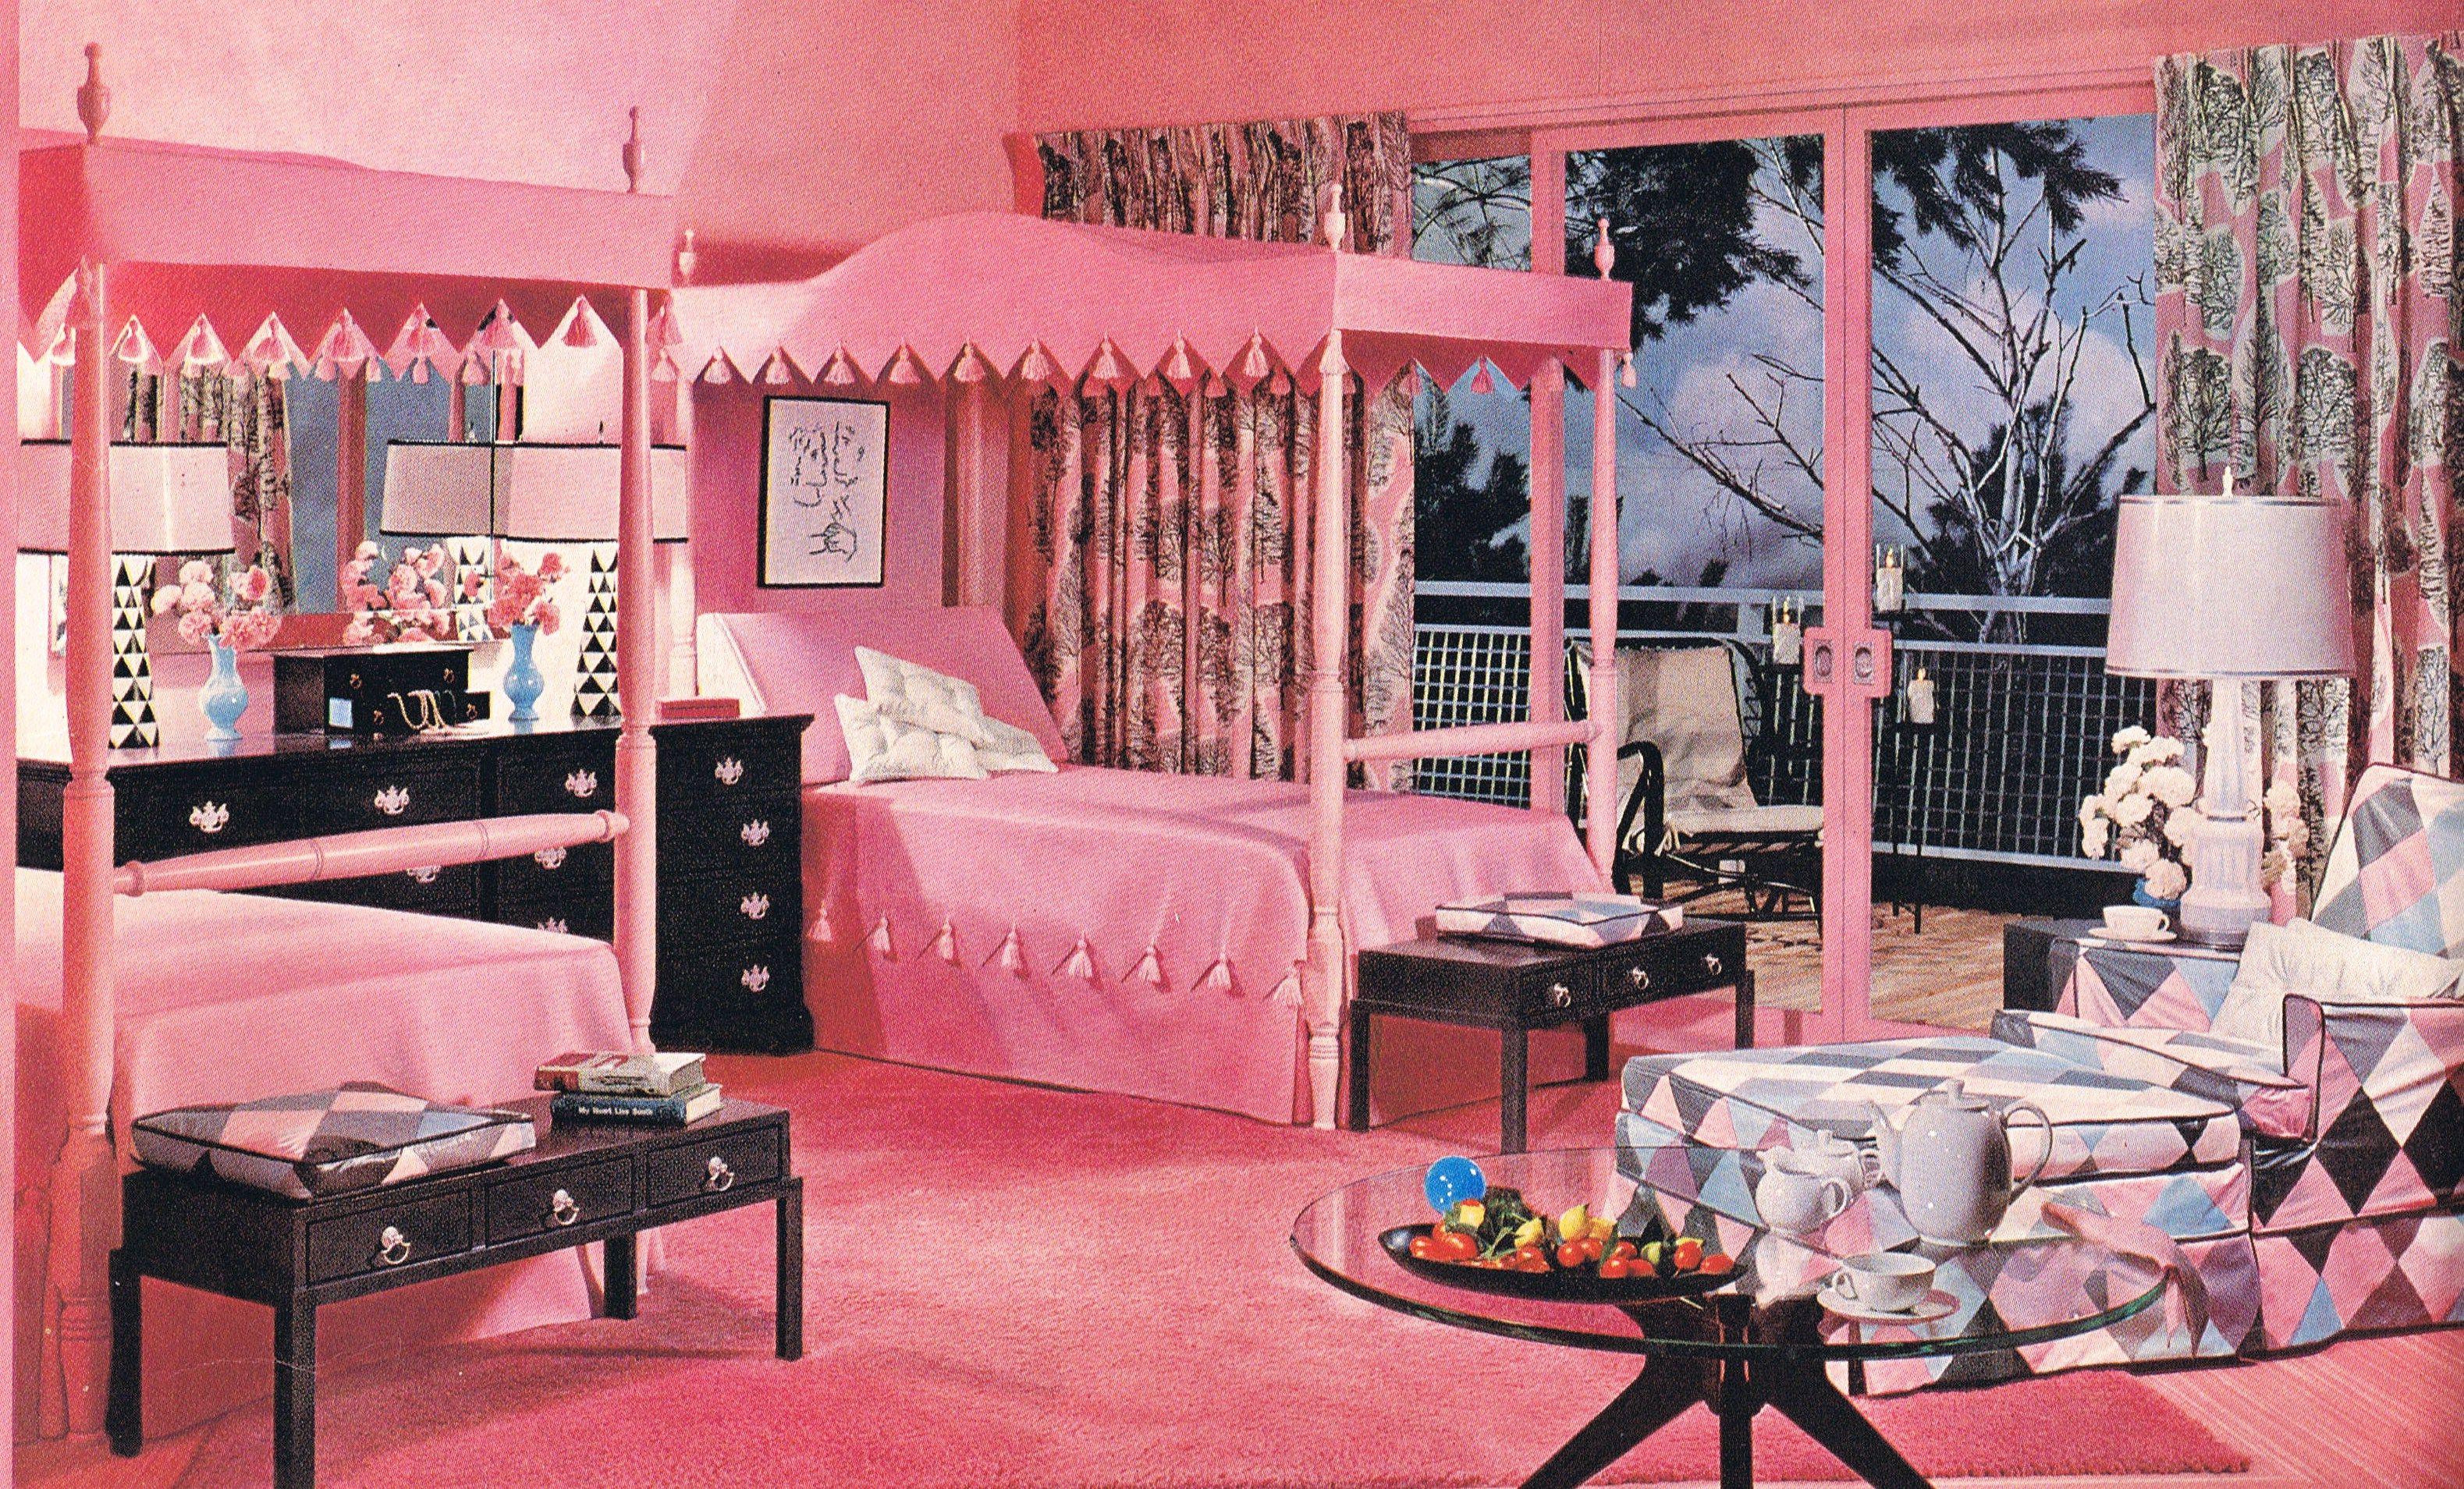 Mid Century Modern • • vintage pink & black bedroom